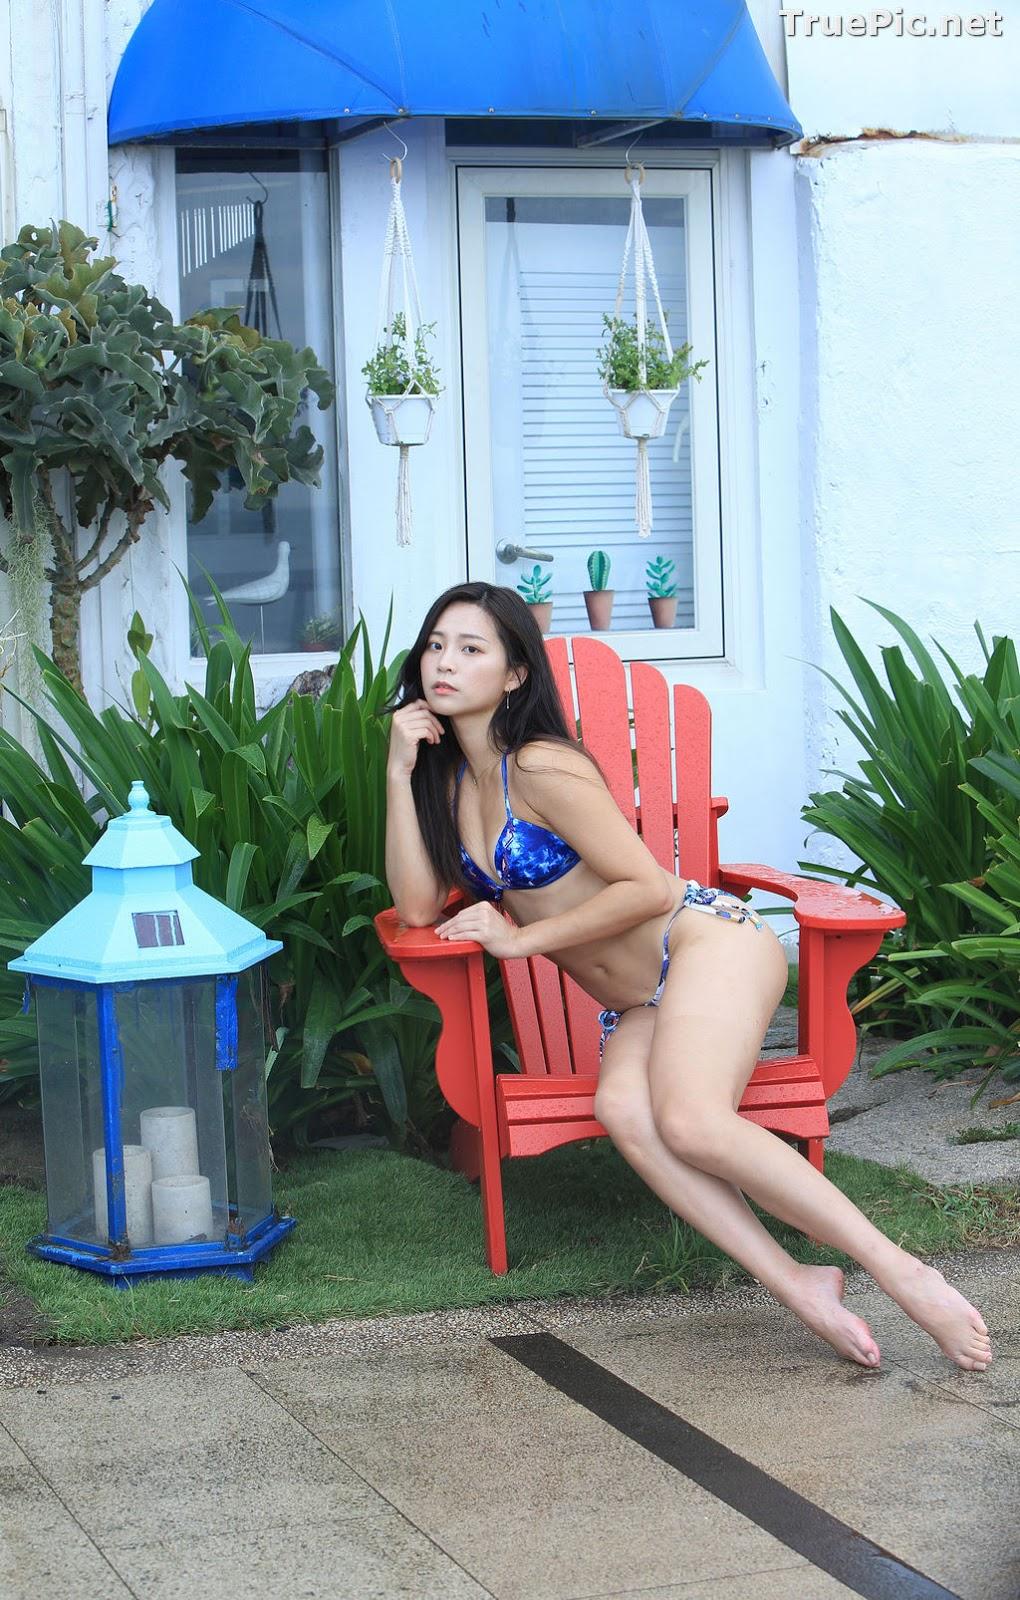 Image Taiwanese Model - Shelly - Beautiful Bodybuilding Bikini Girl - TruePic.net - Picture-74